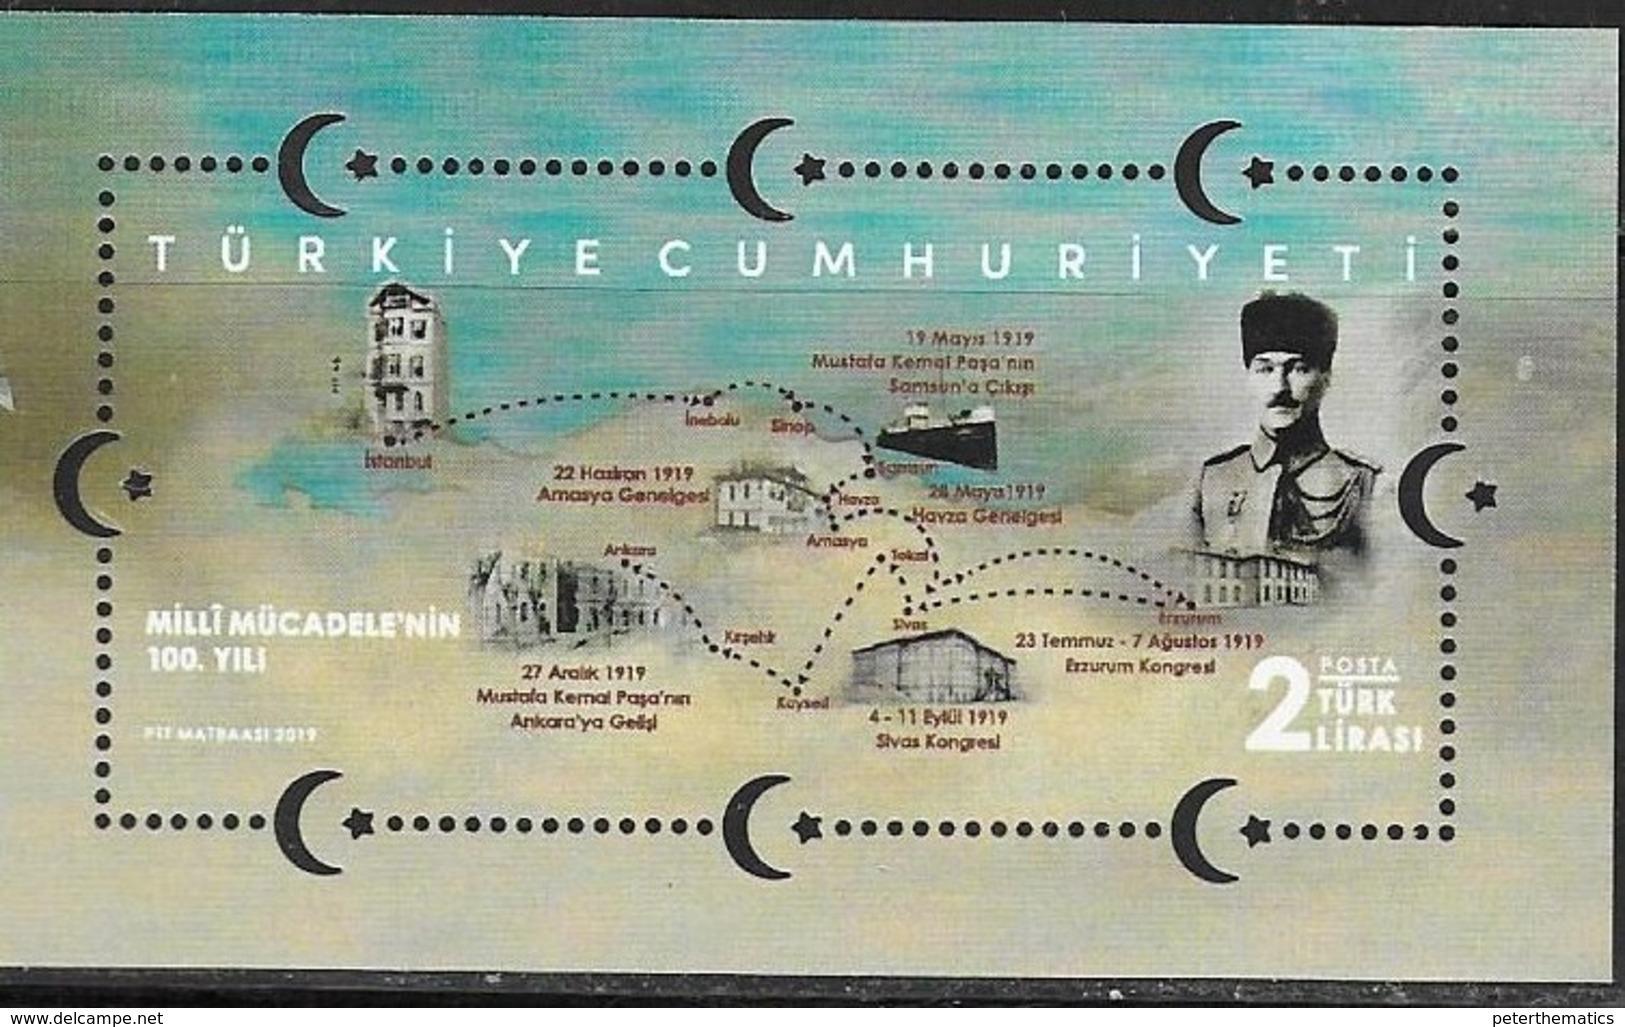 TURKEY, 2019, MNH, CENTENARY OF NATIONAL STRUGGLE, MAPS, SHIPS,  S/SHEET - History